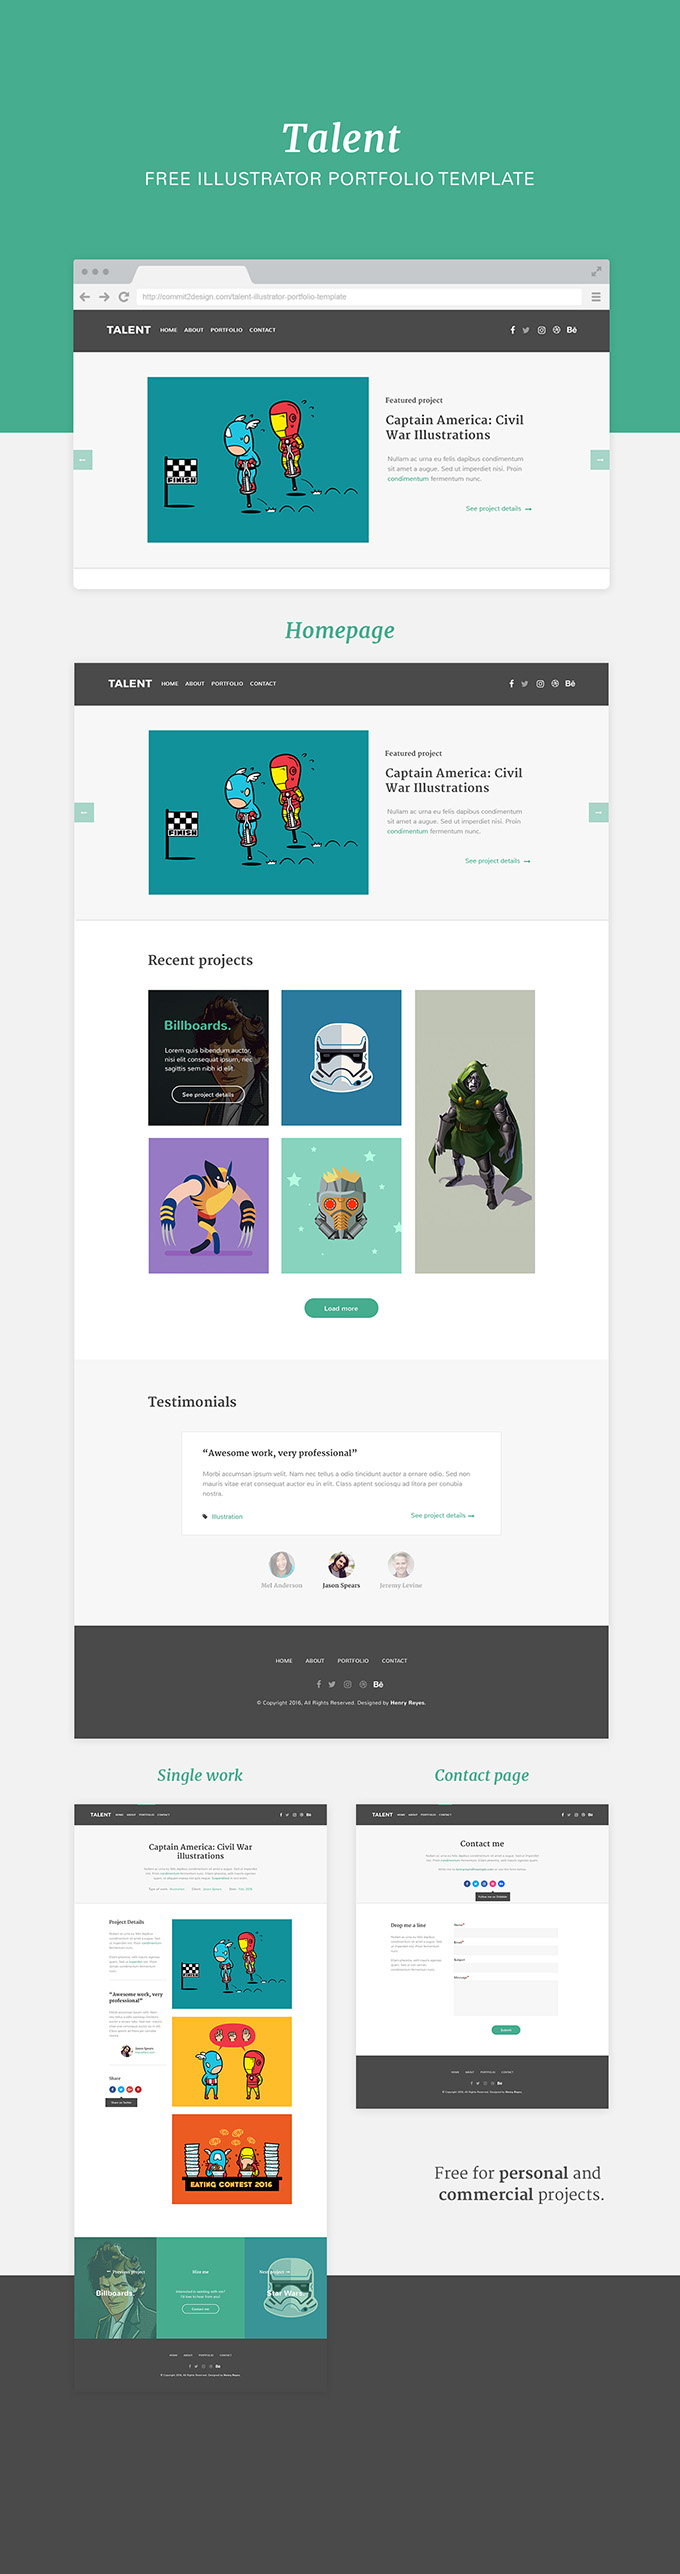 Talent, illustrator portfolio template preview